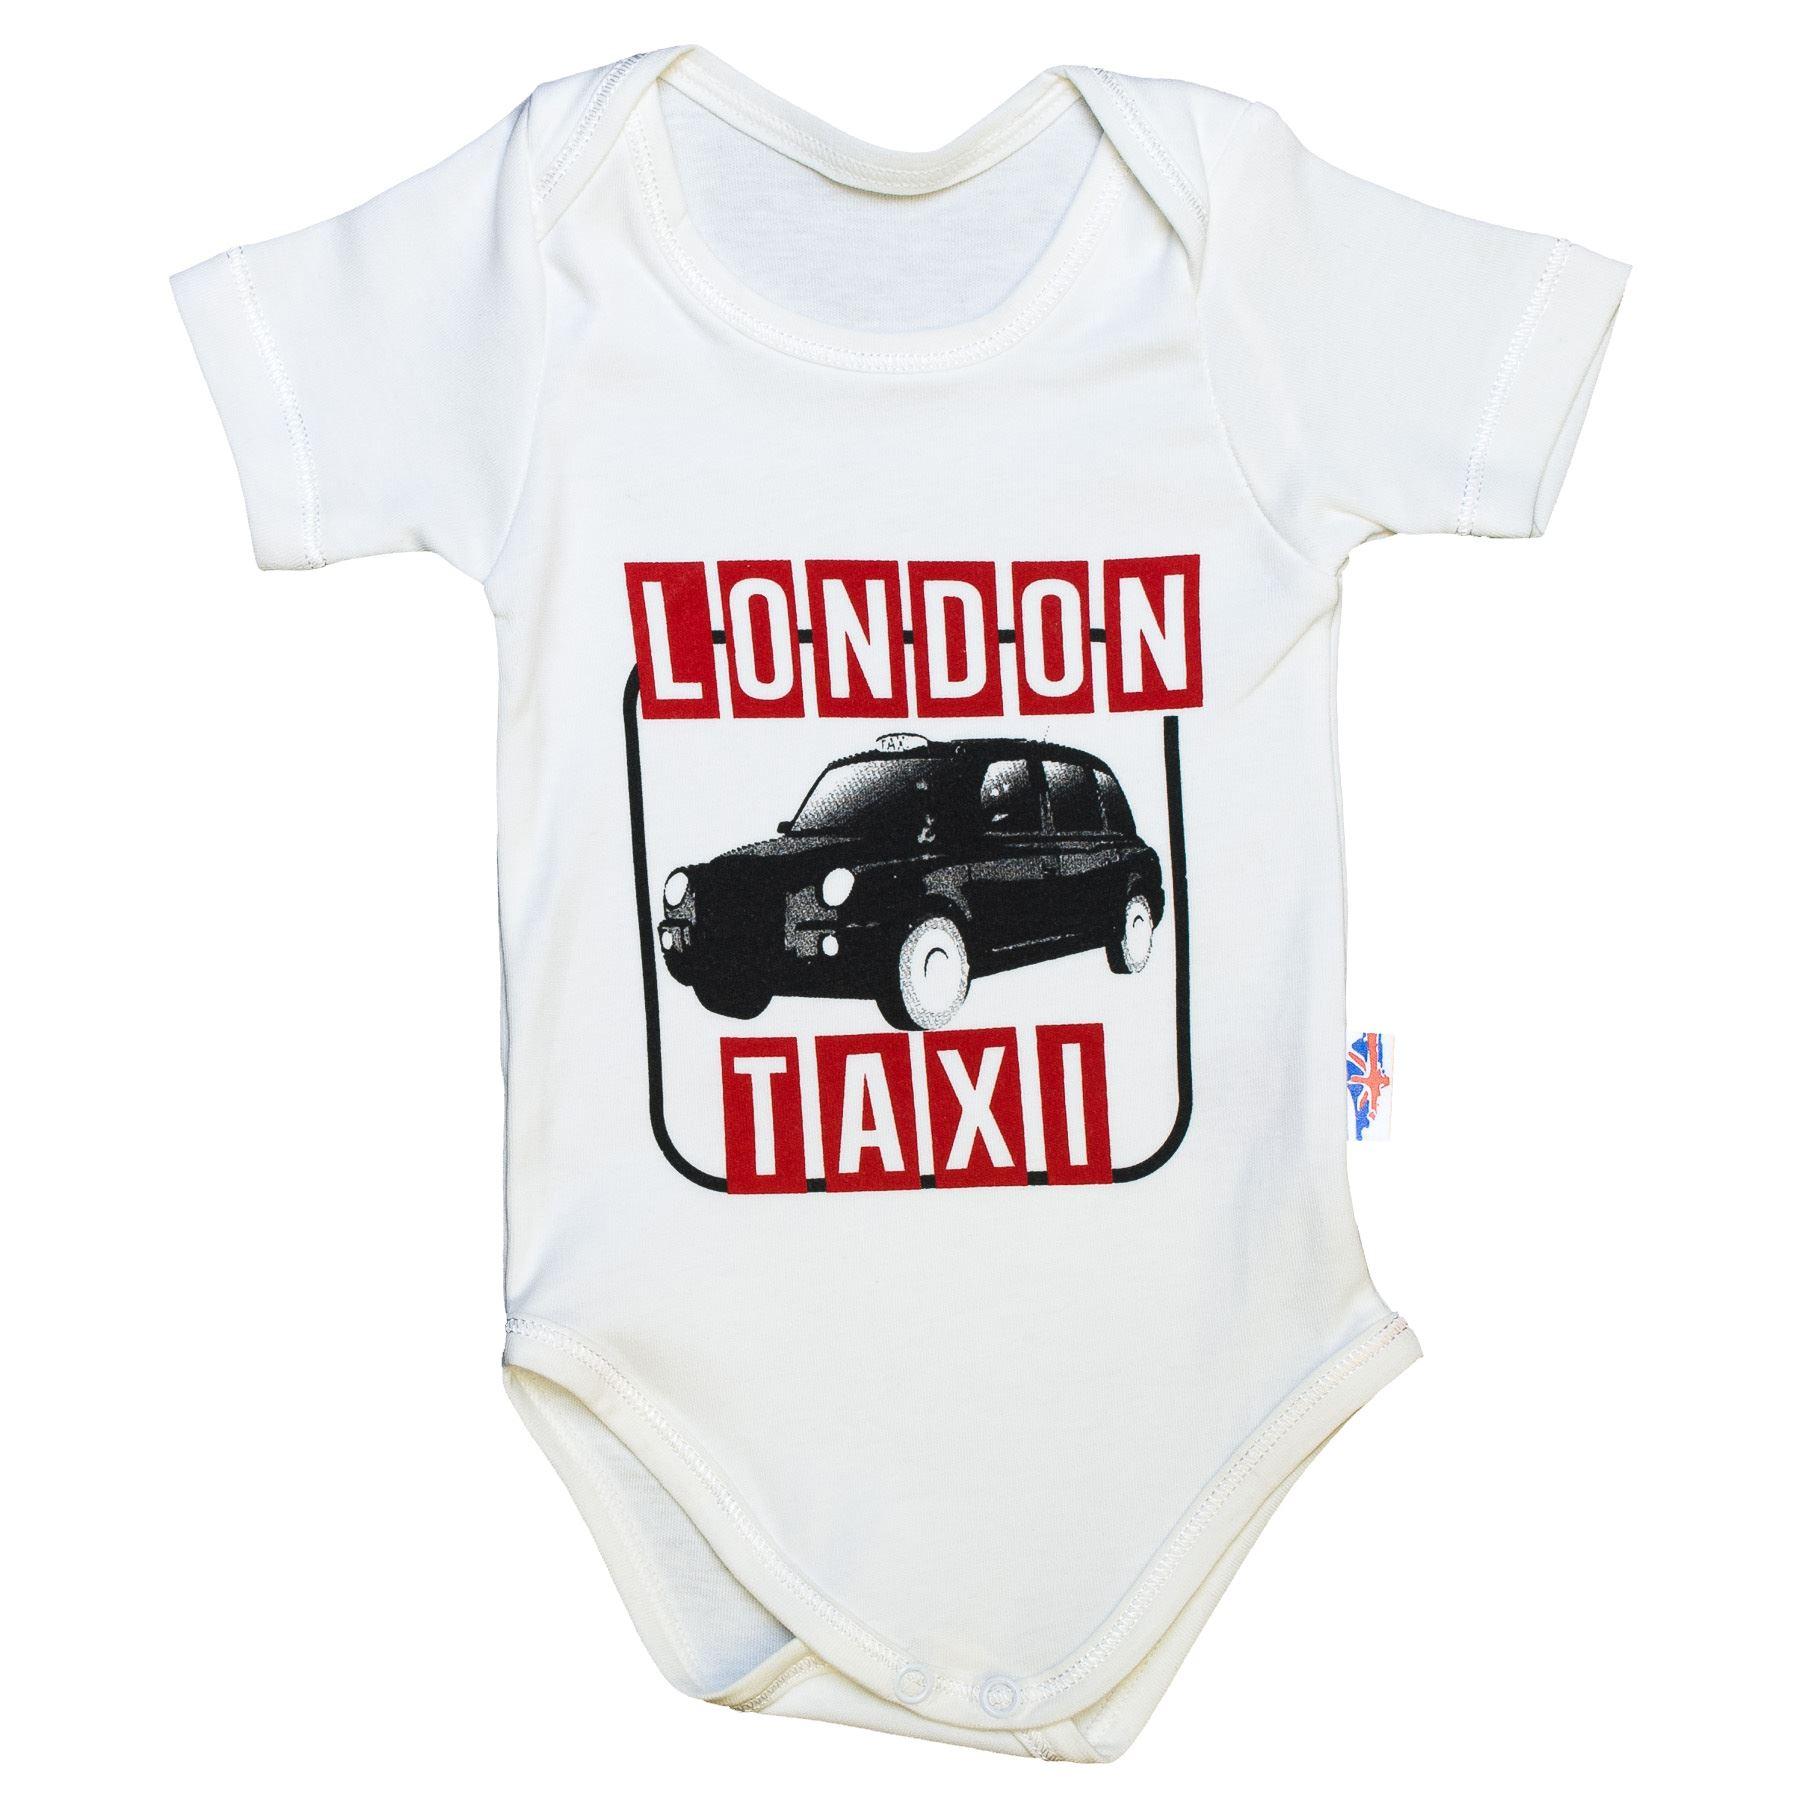 Baby Souvenir Body Suit Boy Girl Uni I Love GB Keep Calm Red Bus